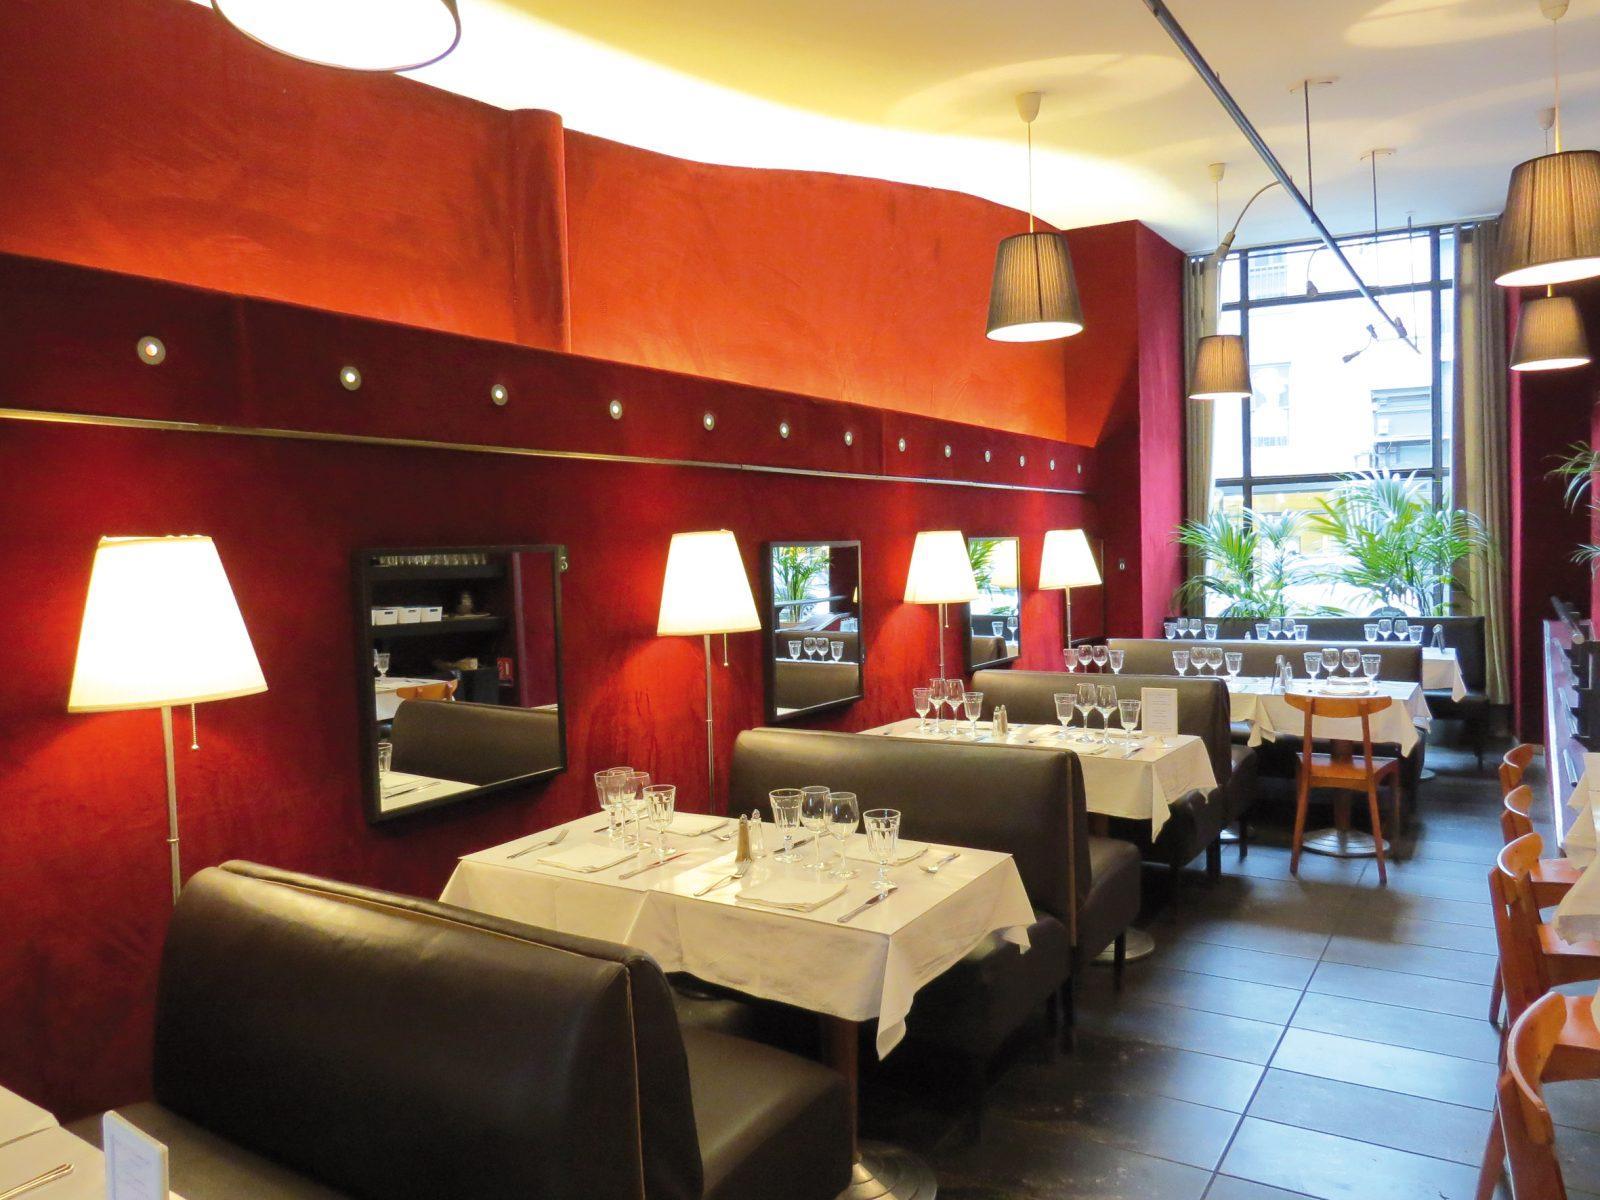 Brasserie le majestic restaurants auvergne vacances for Auvergne cuisine traditionnelle